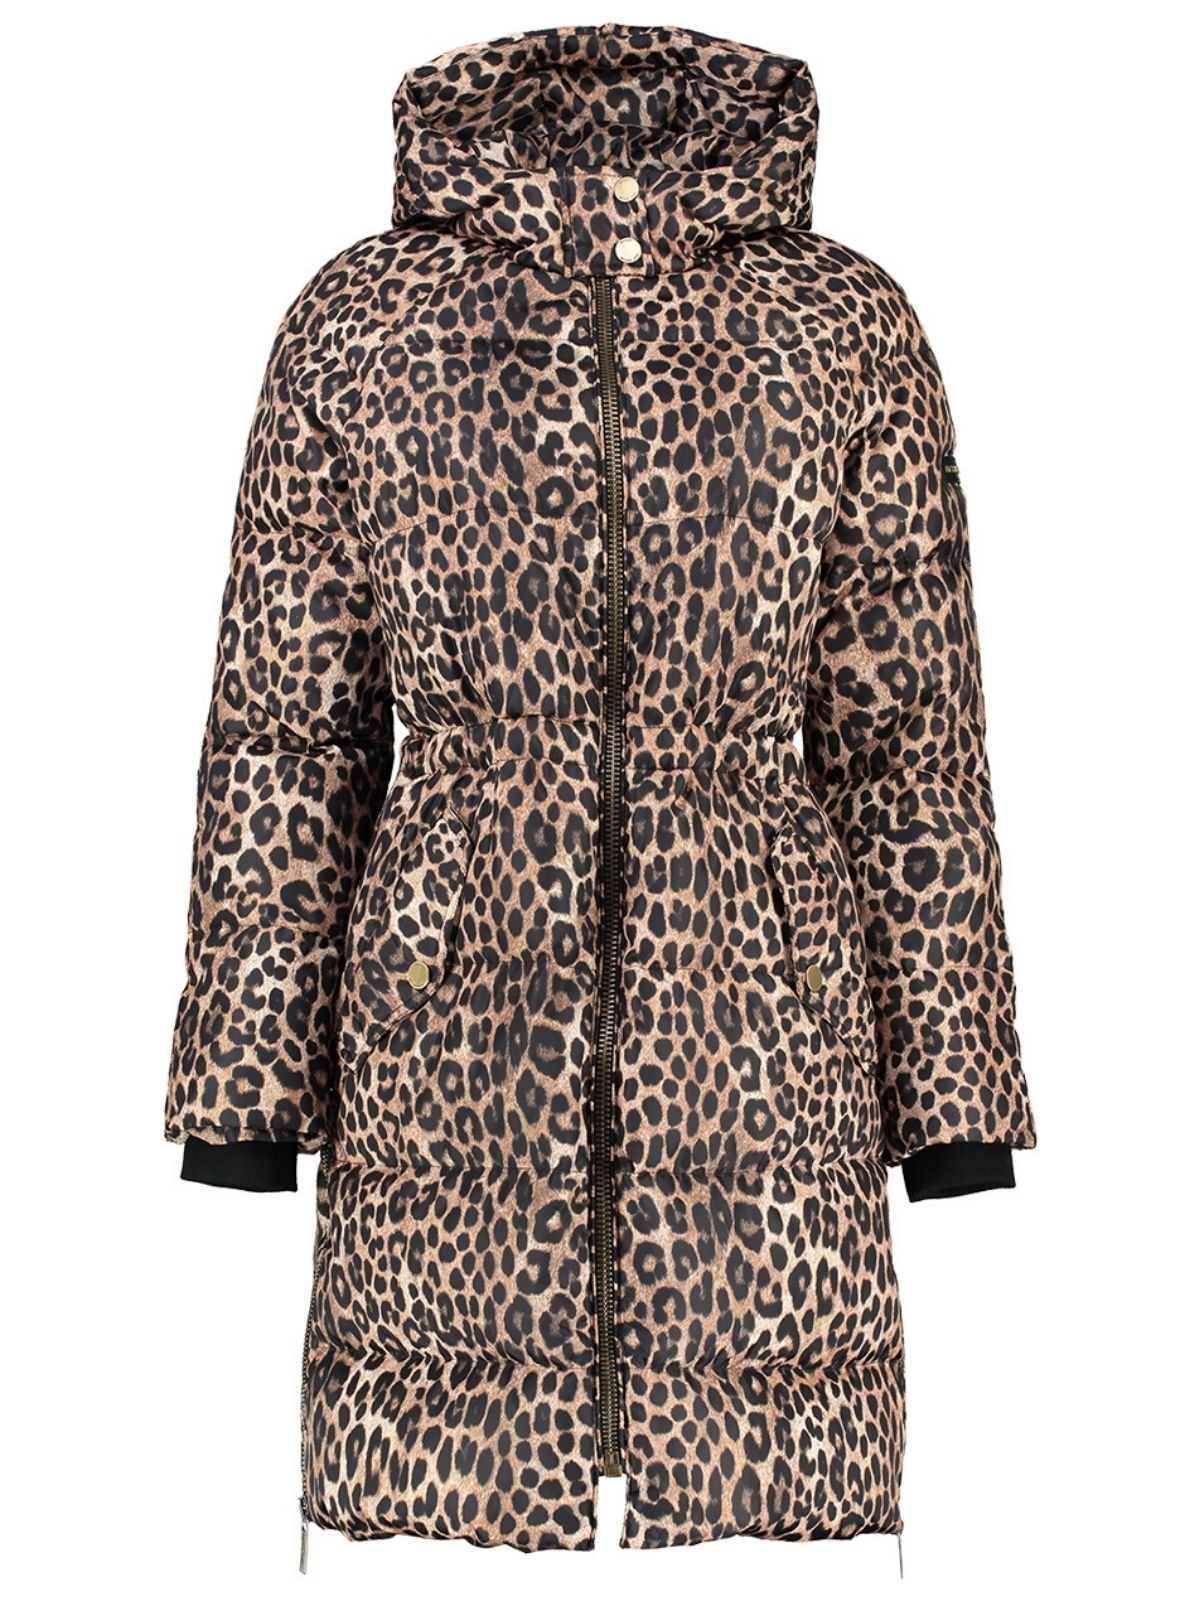 Michael Kors Leopard-Print Ciré Puffer coat